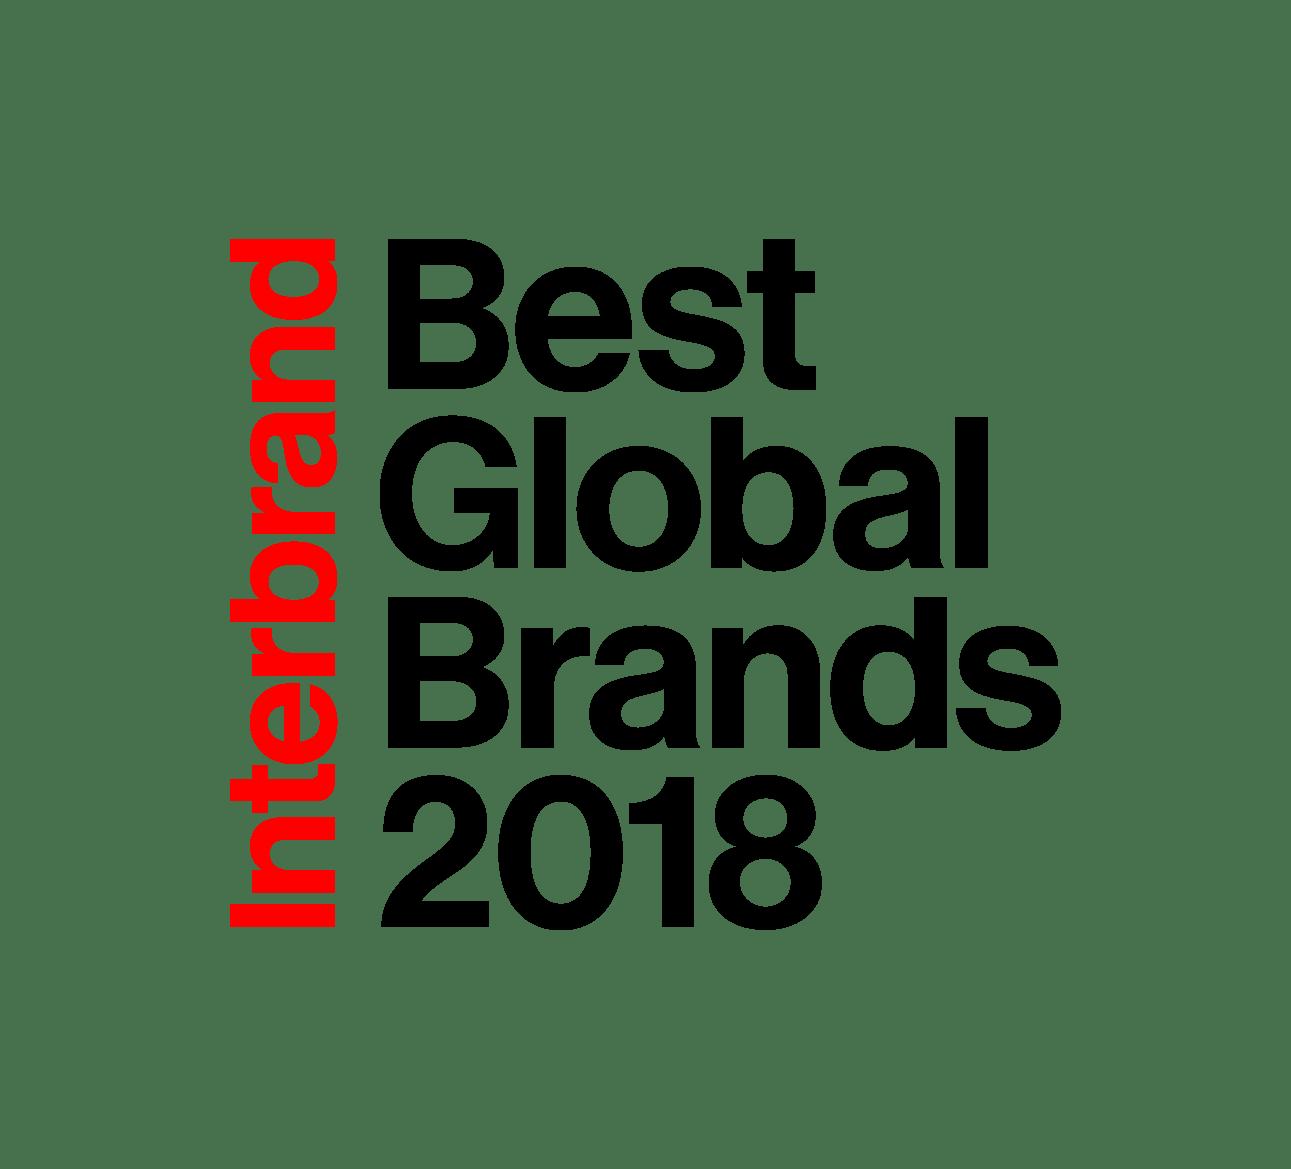 Interbrand Releases 2018 Best Global Brands Report